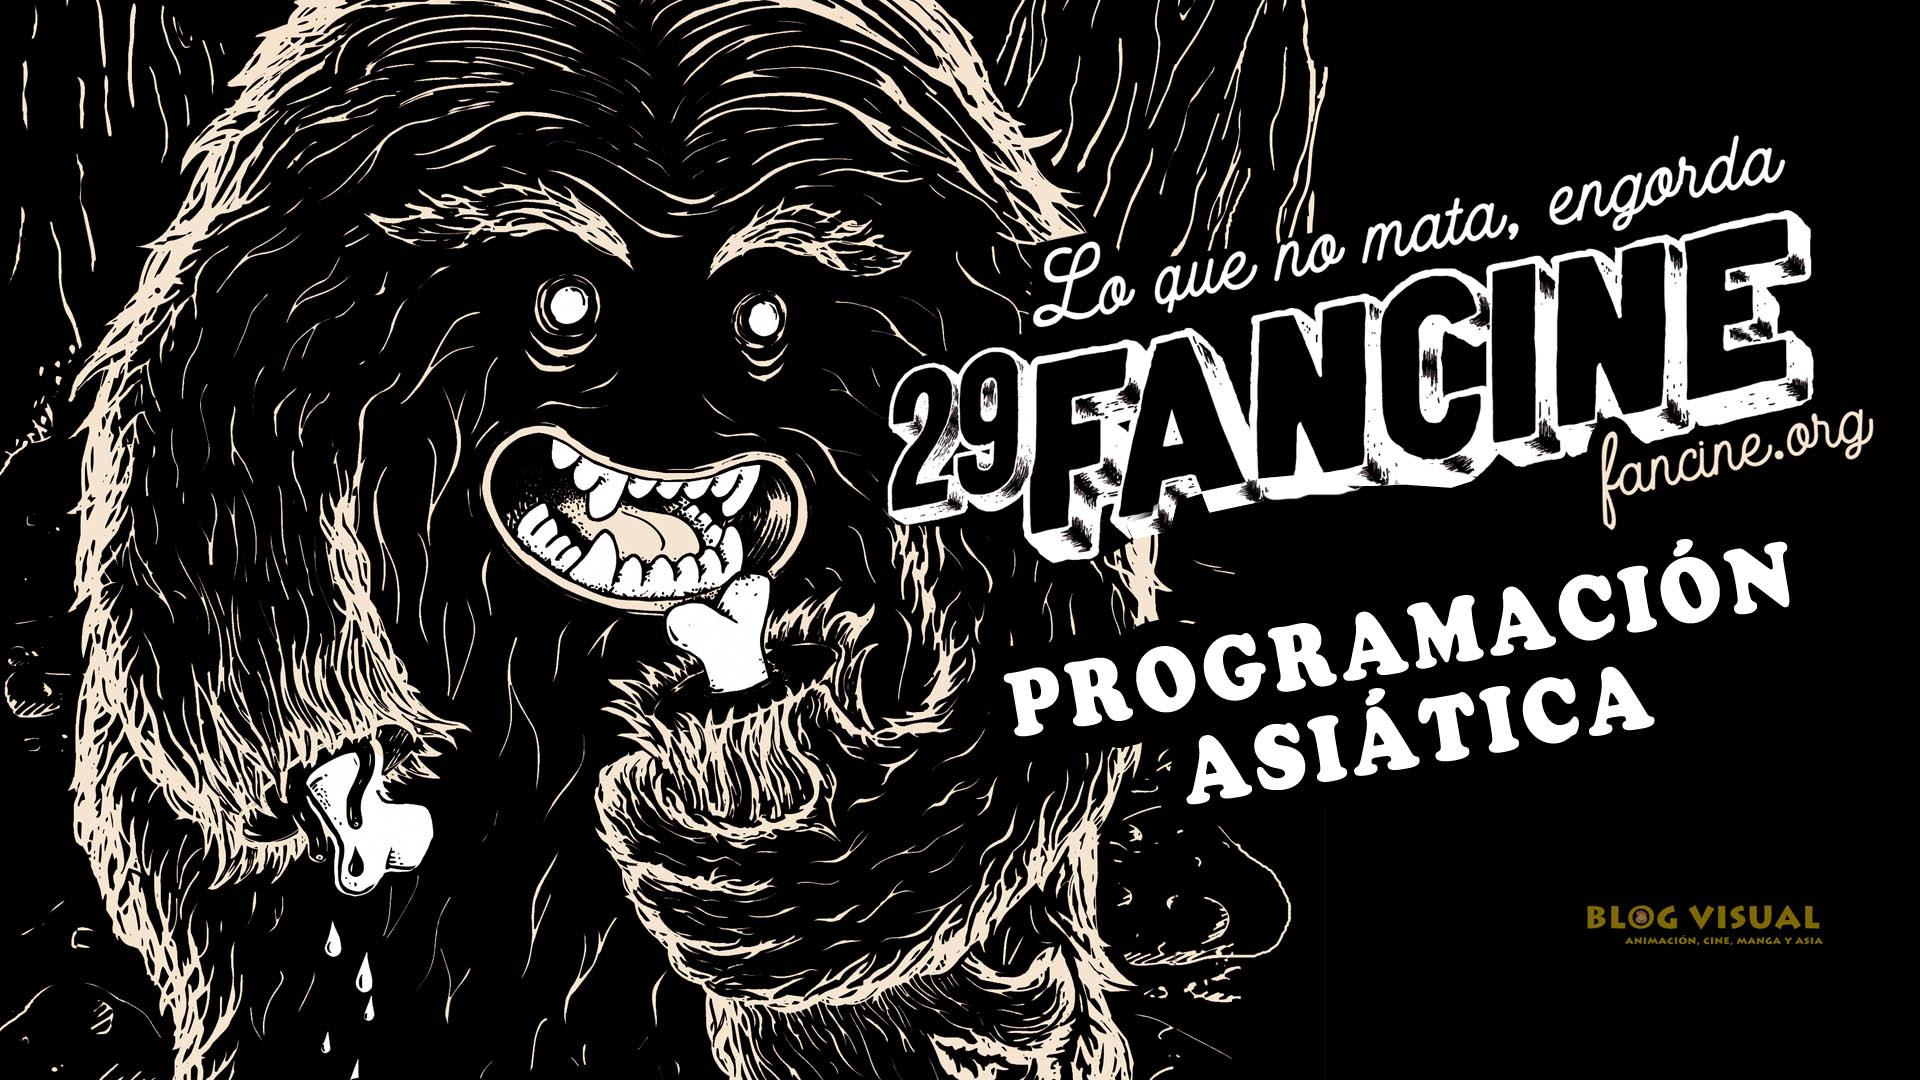 PROGRAMA-ASIA-FANCINE-19.jpg